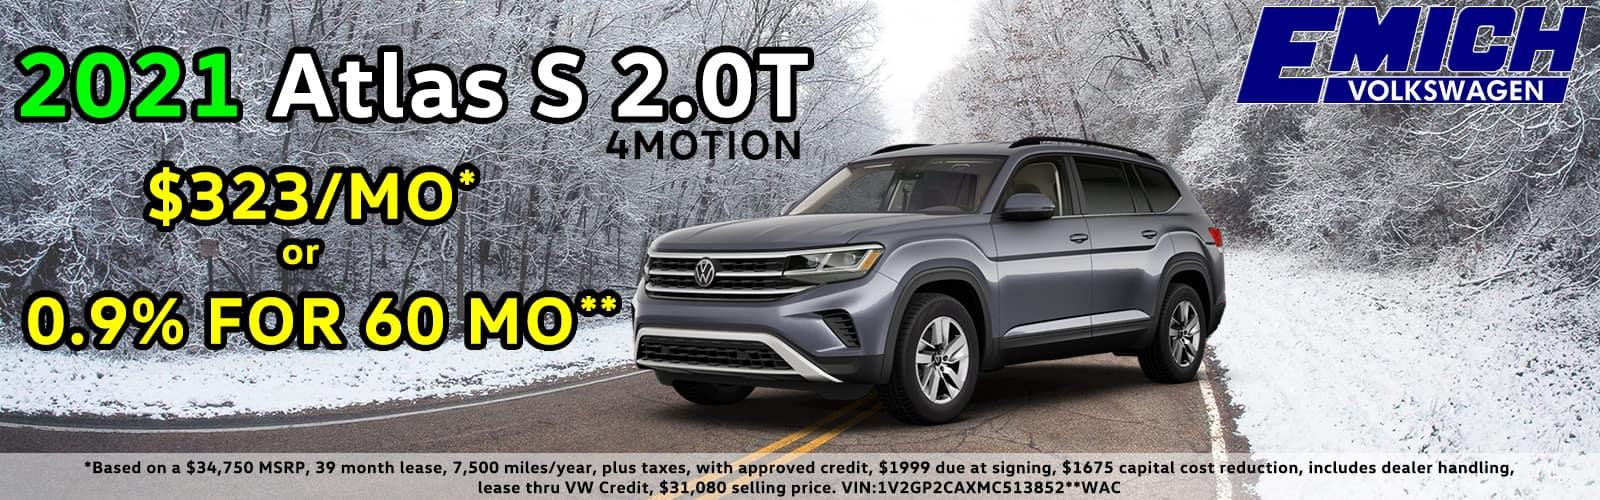 2021 VW Atlas Special Deal